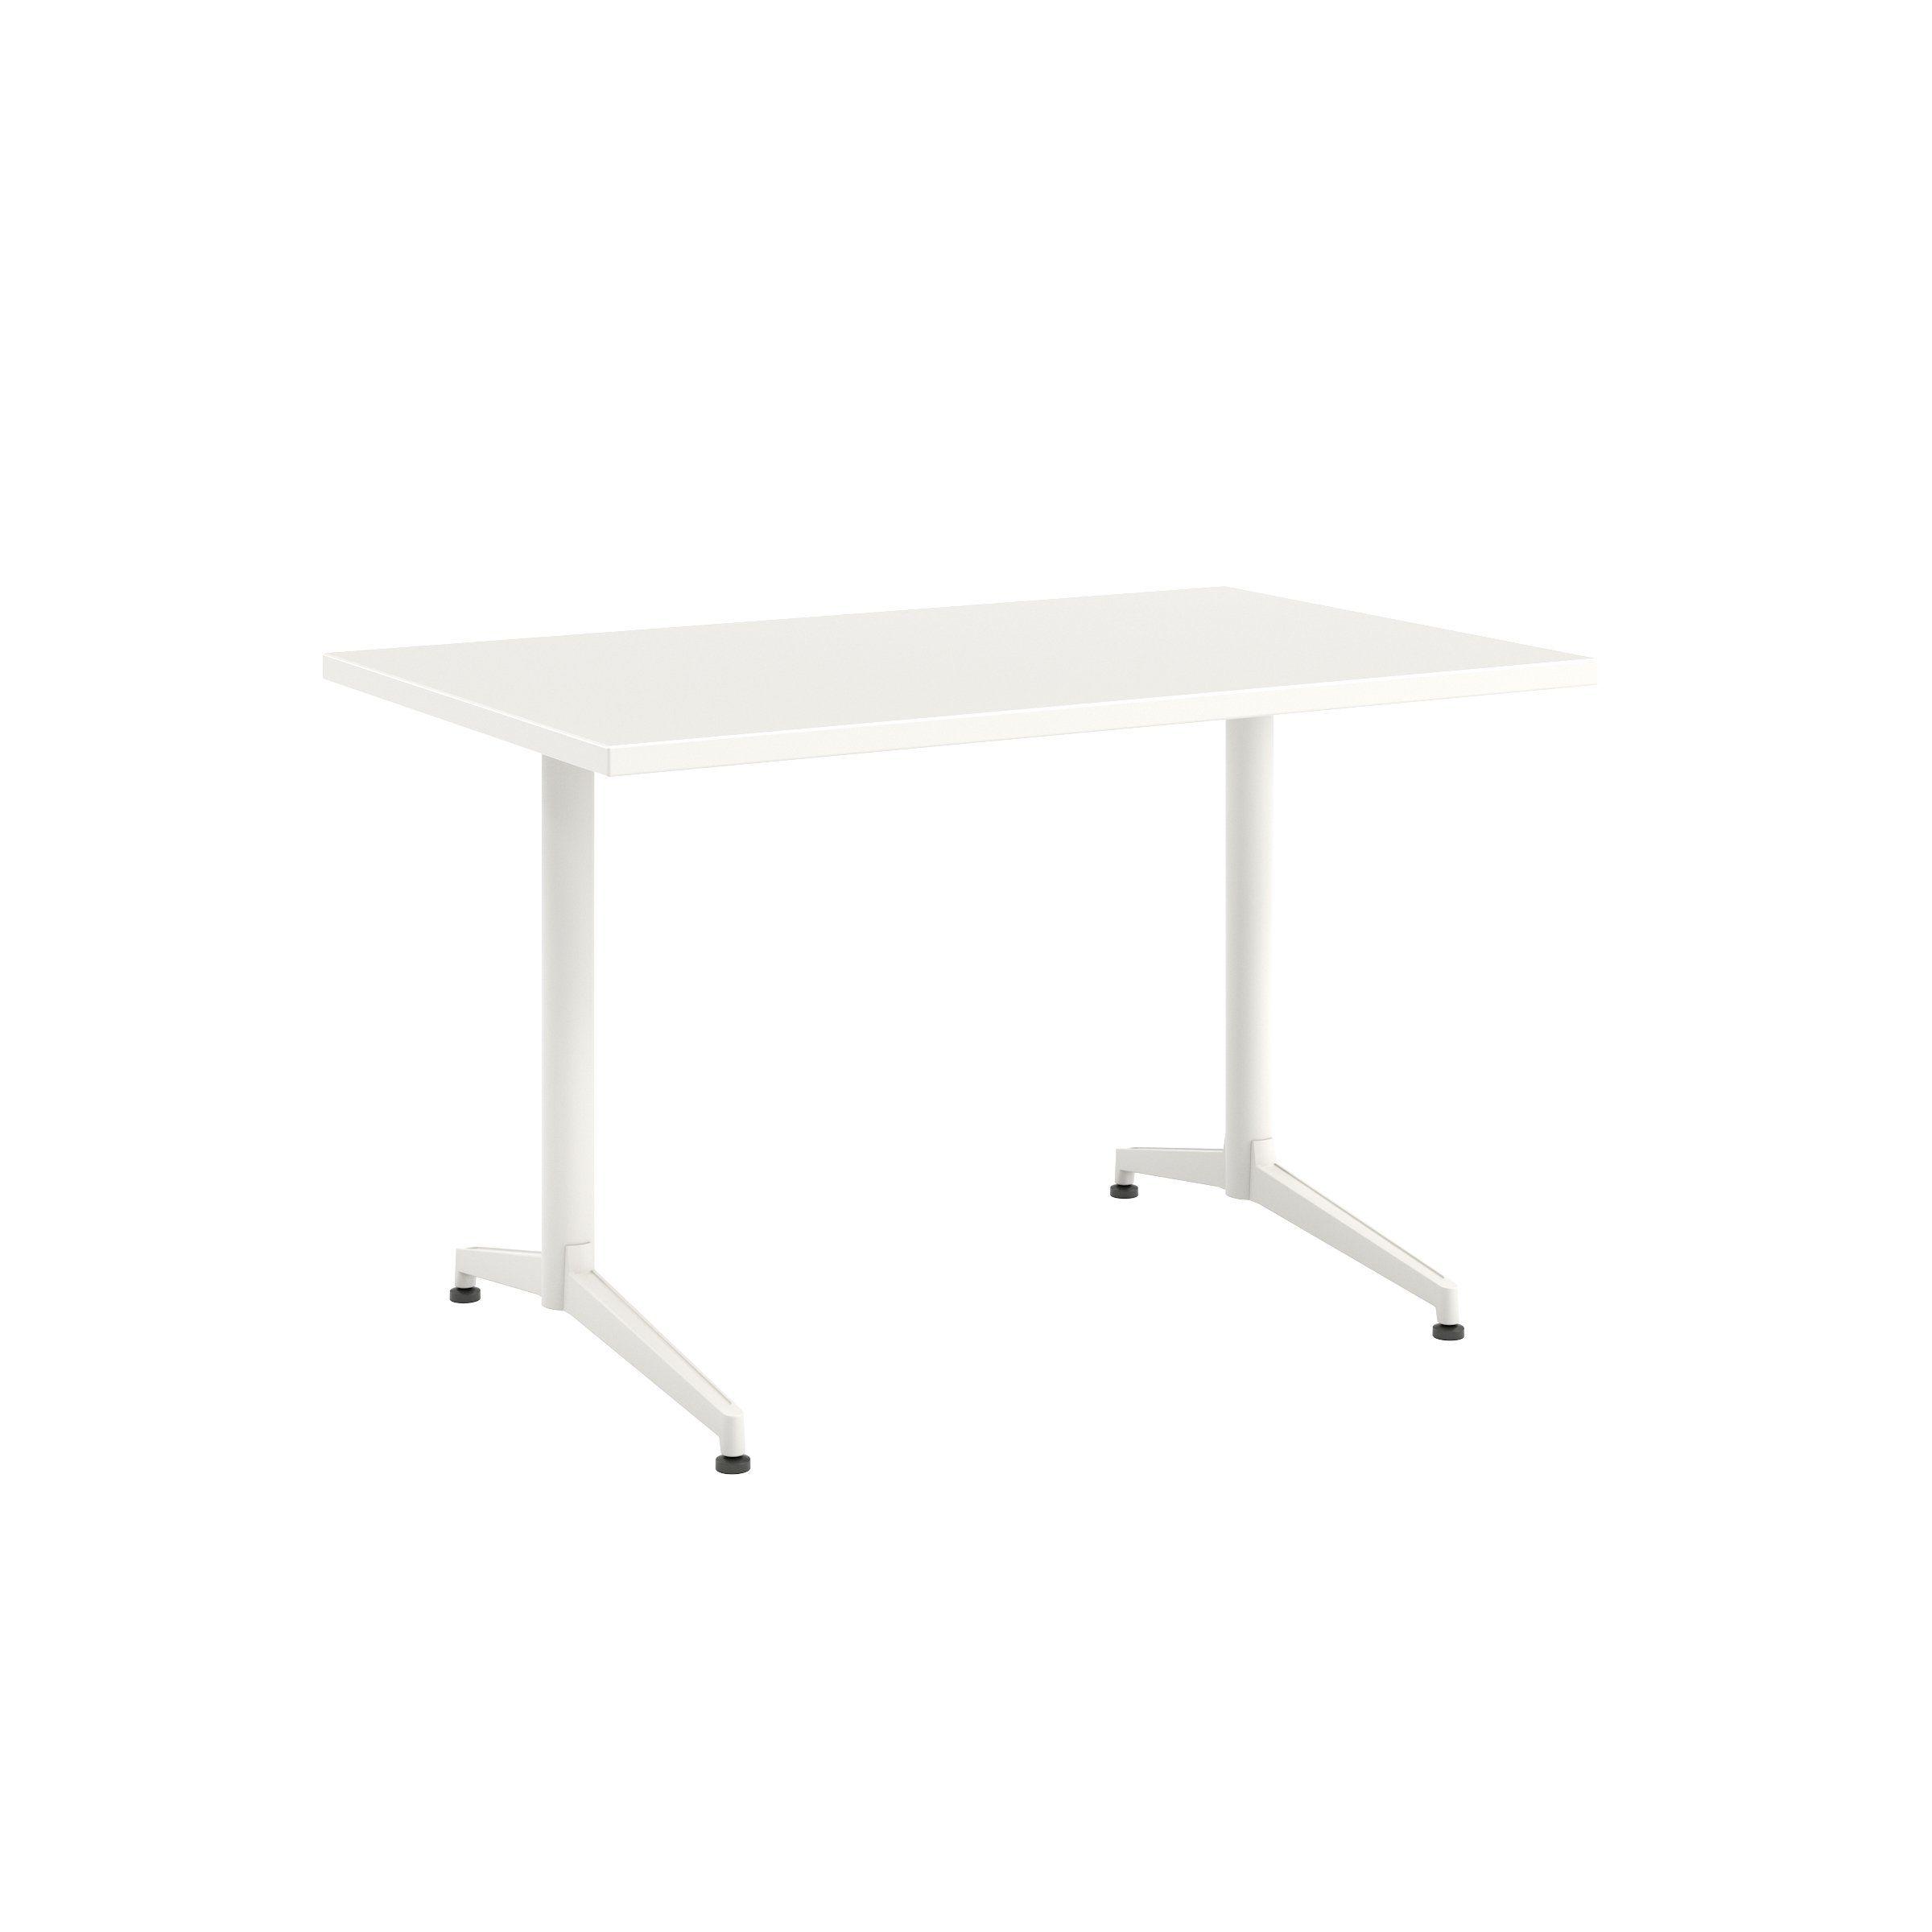 Photo of Jive Desk with C-Leg Base – 30D x 48W / Linen / Smooth Plast…